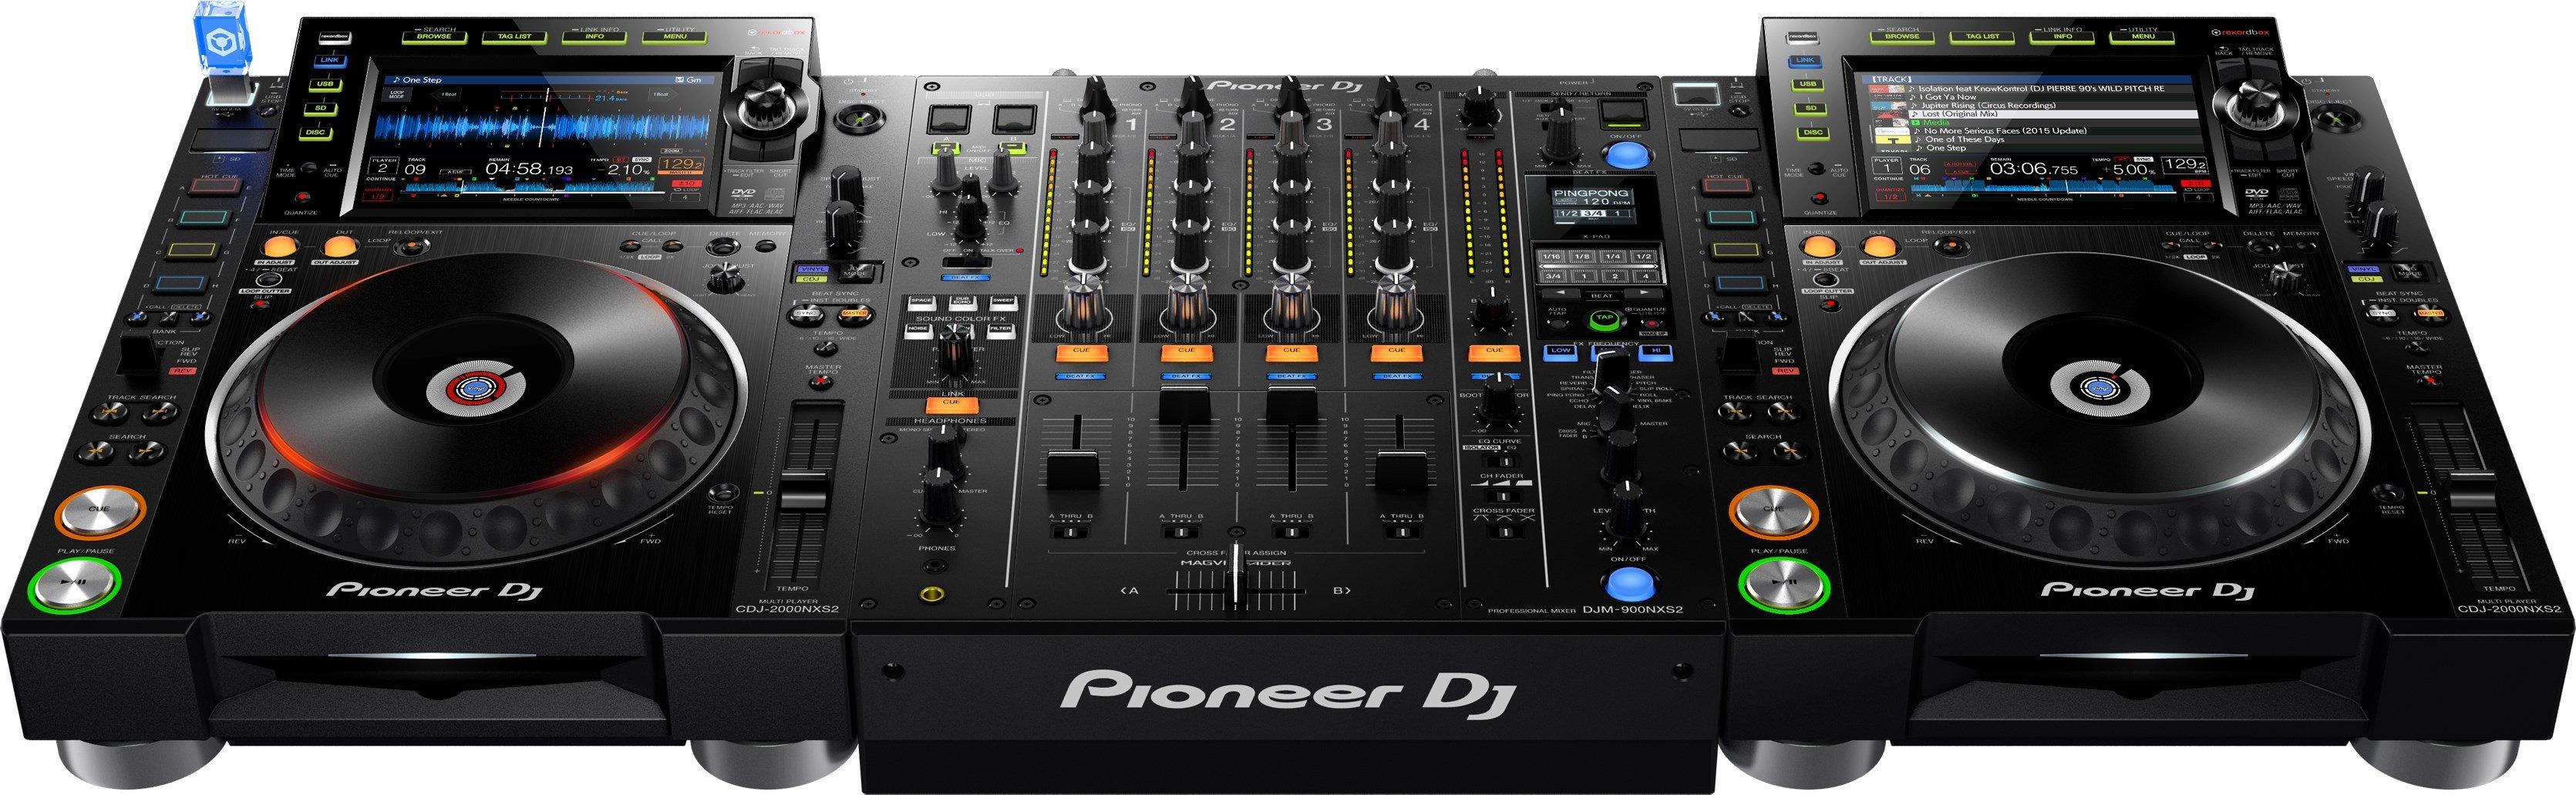 Cdj & mixer merk pioneer type Djm-900nxs2